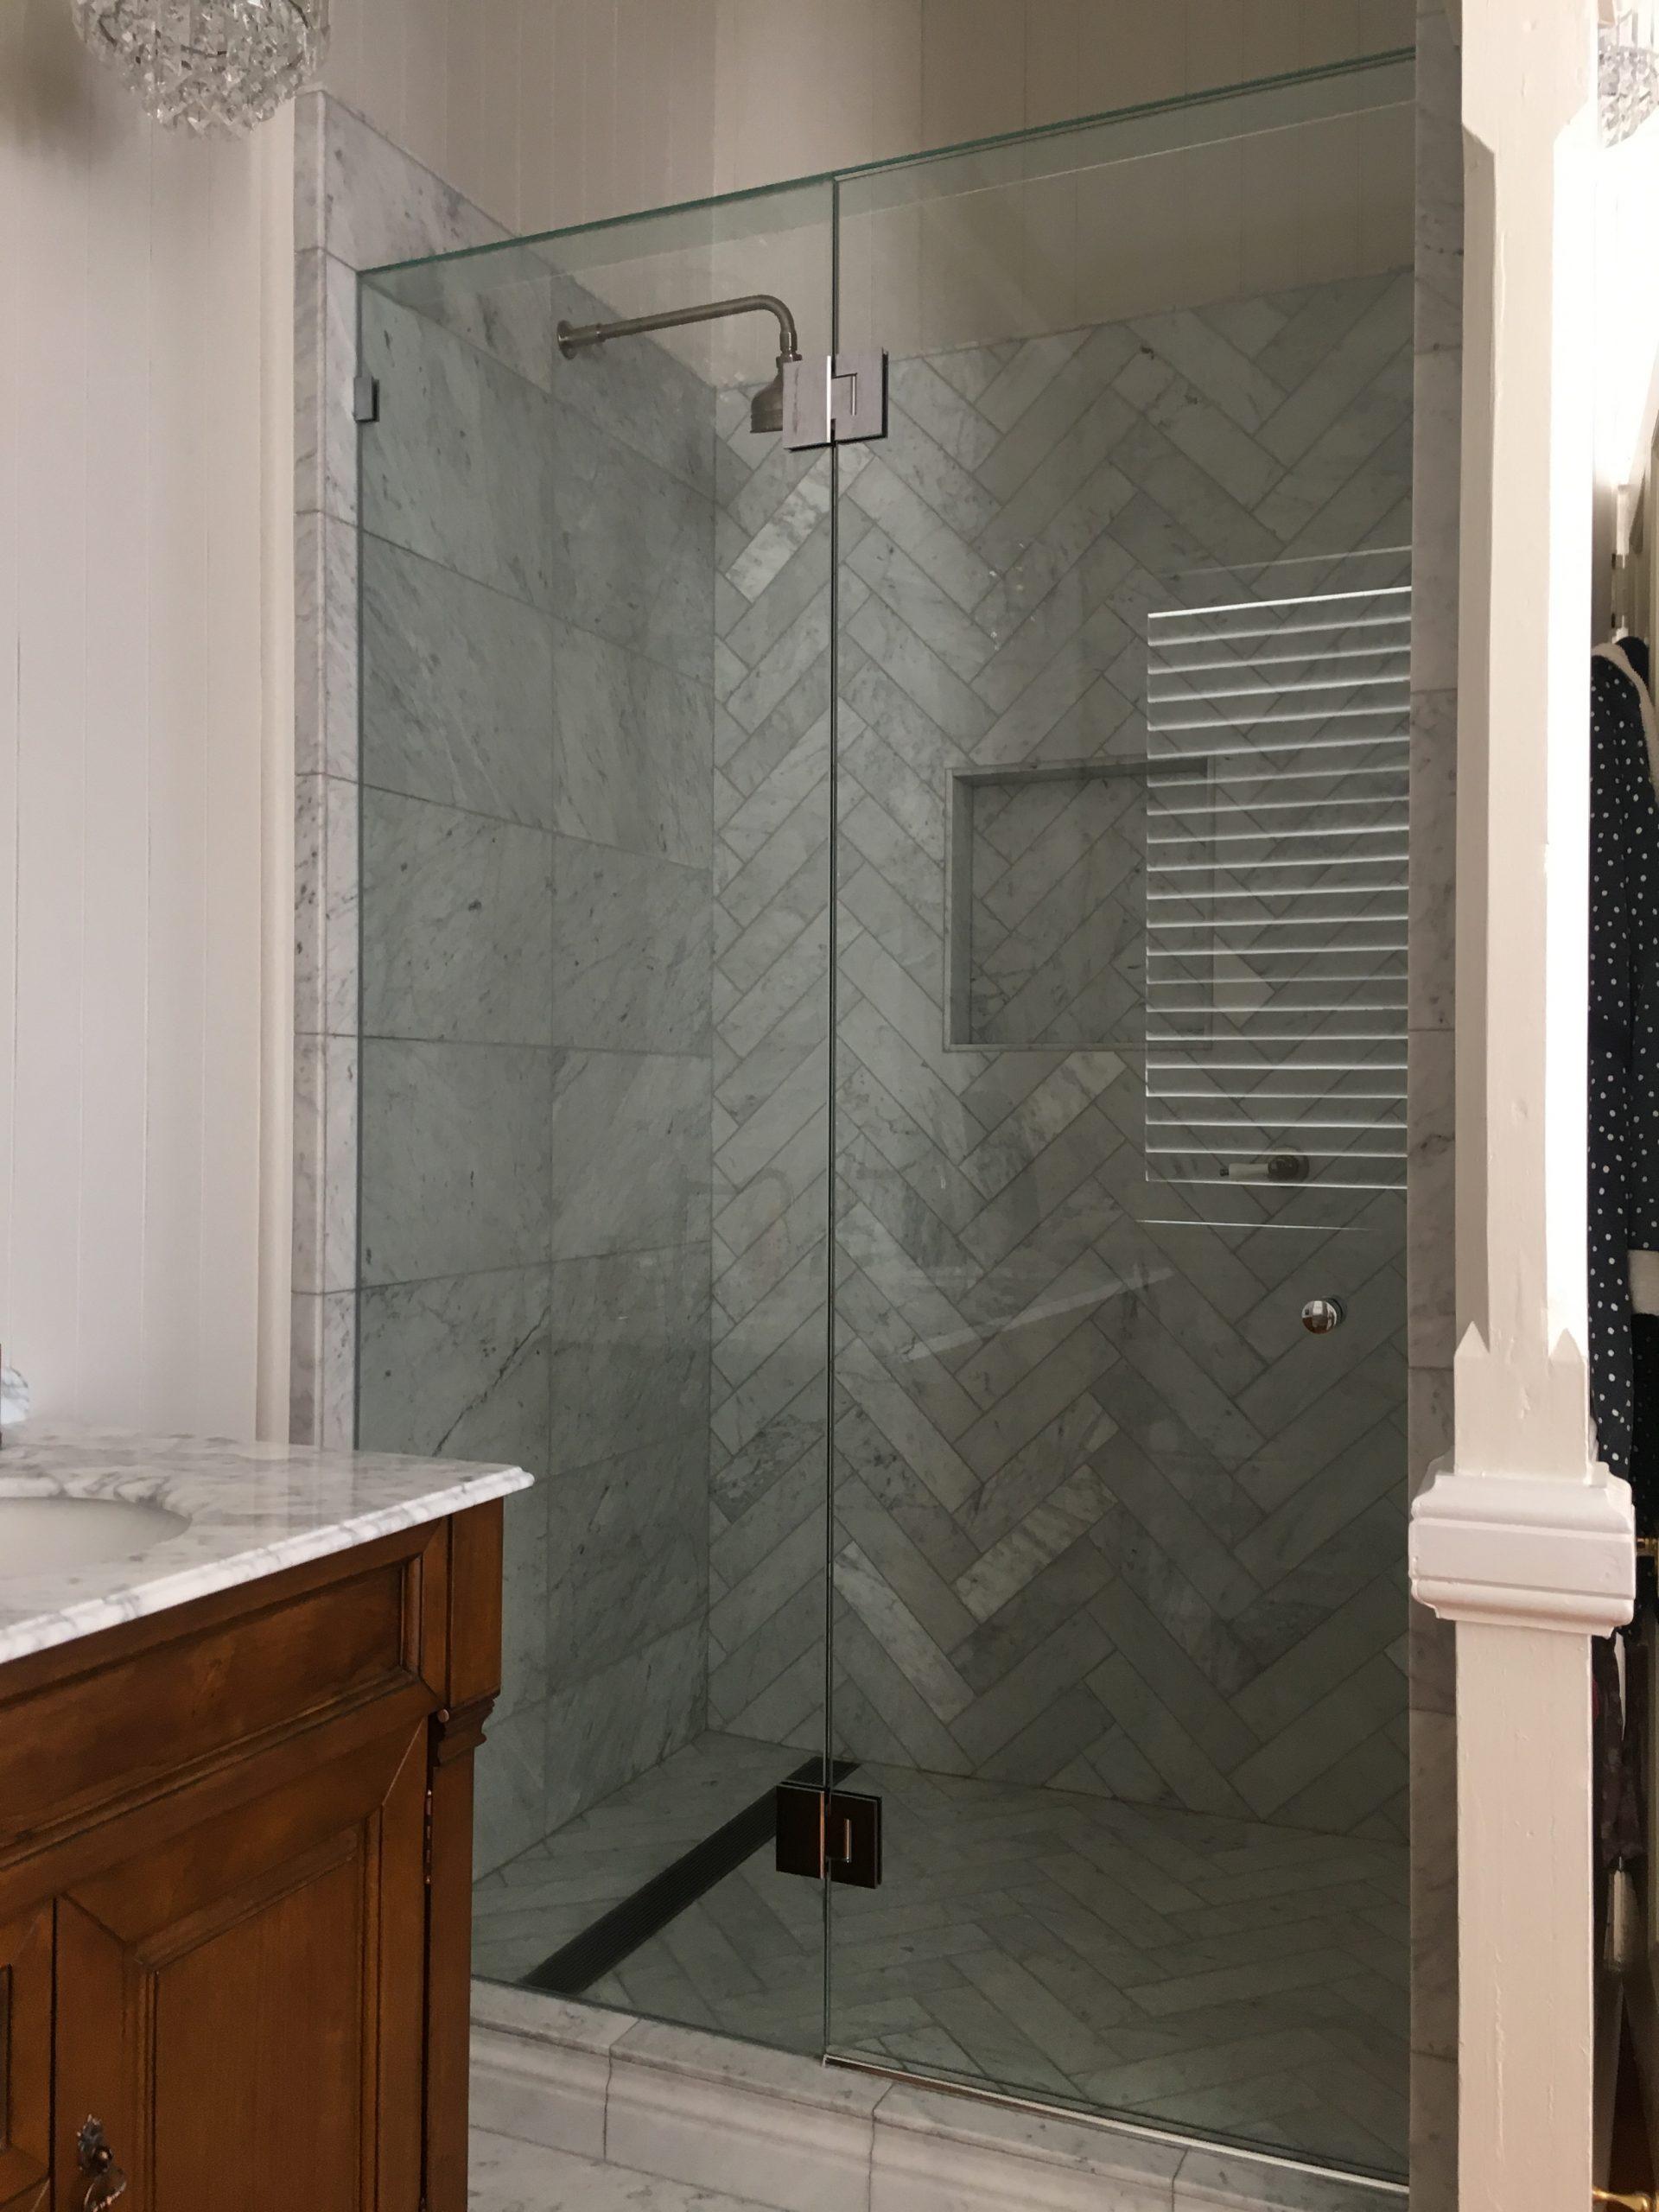 Glass Shower Doors 101: How Do I Take Care of Them?